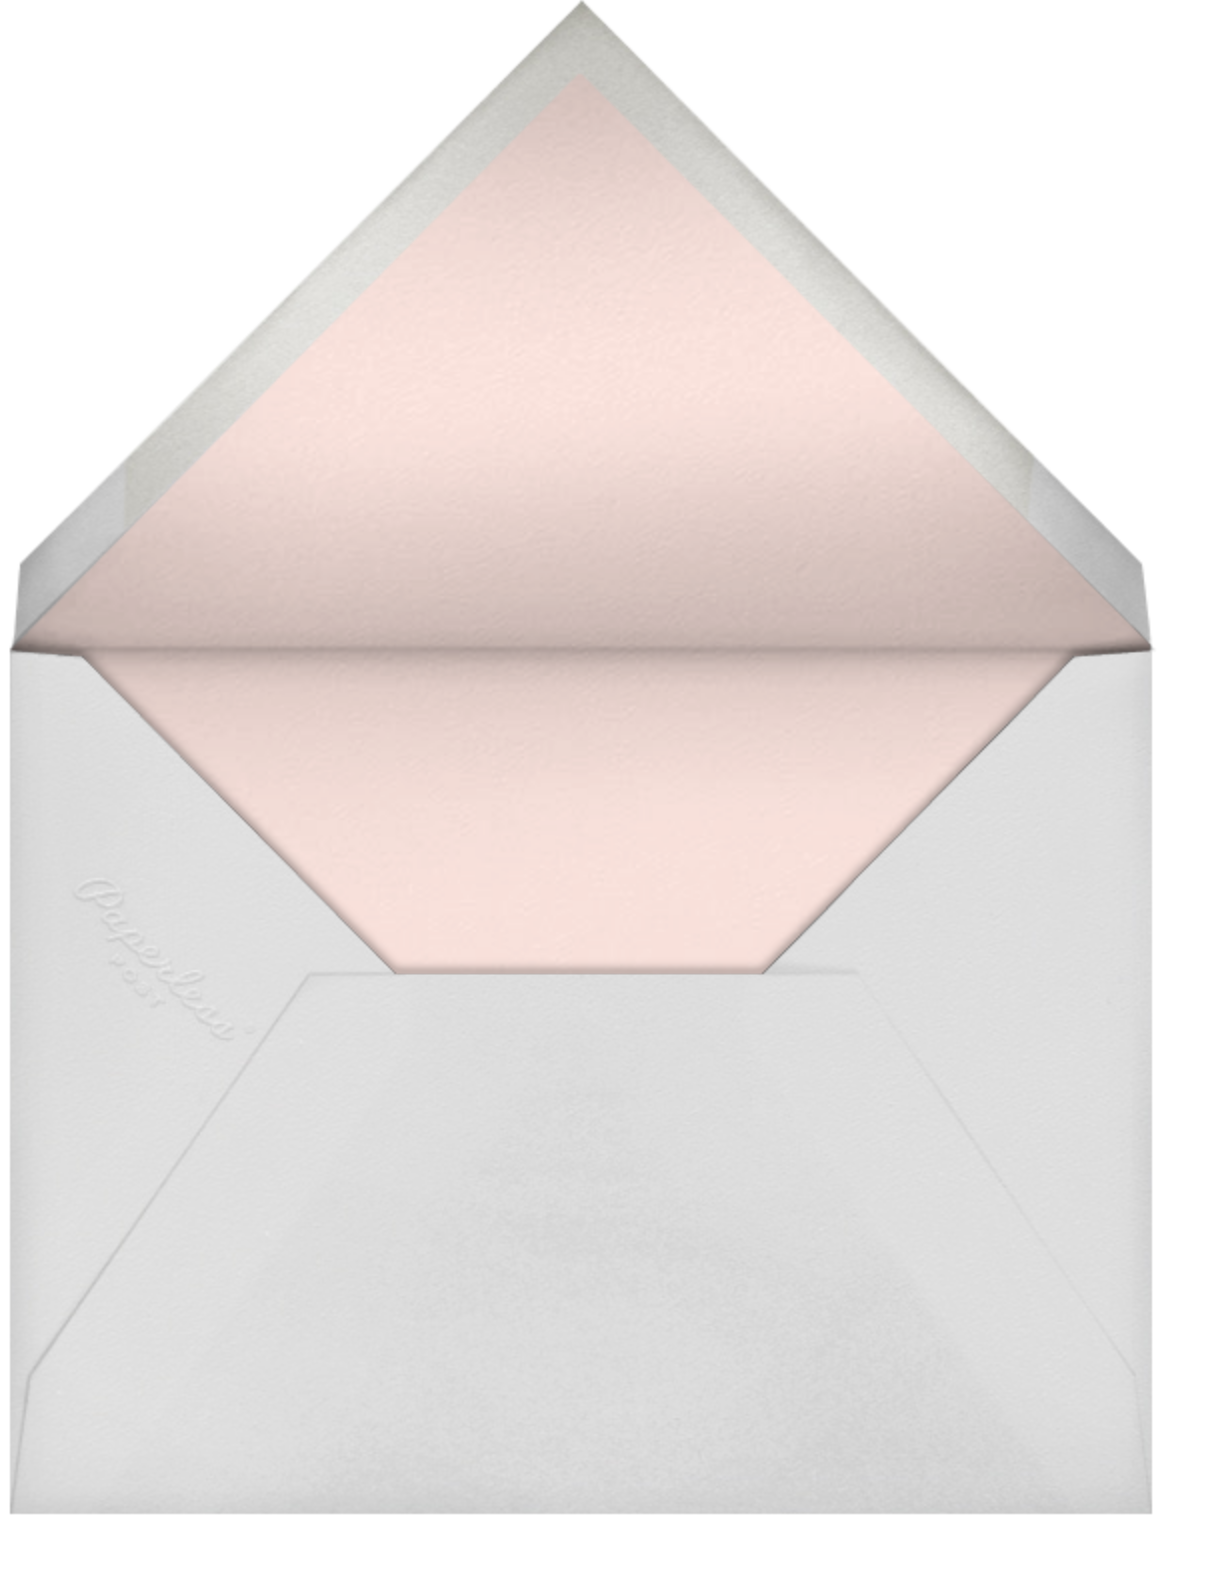 Radiant Swirls (Invitation) - Silver - Oscar de la Renta - All - envelope back